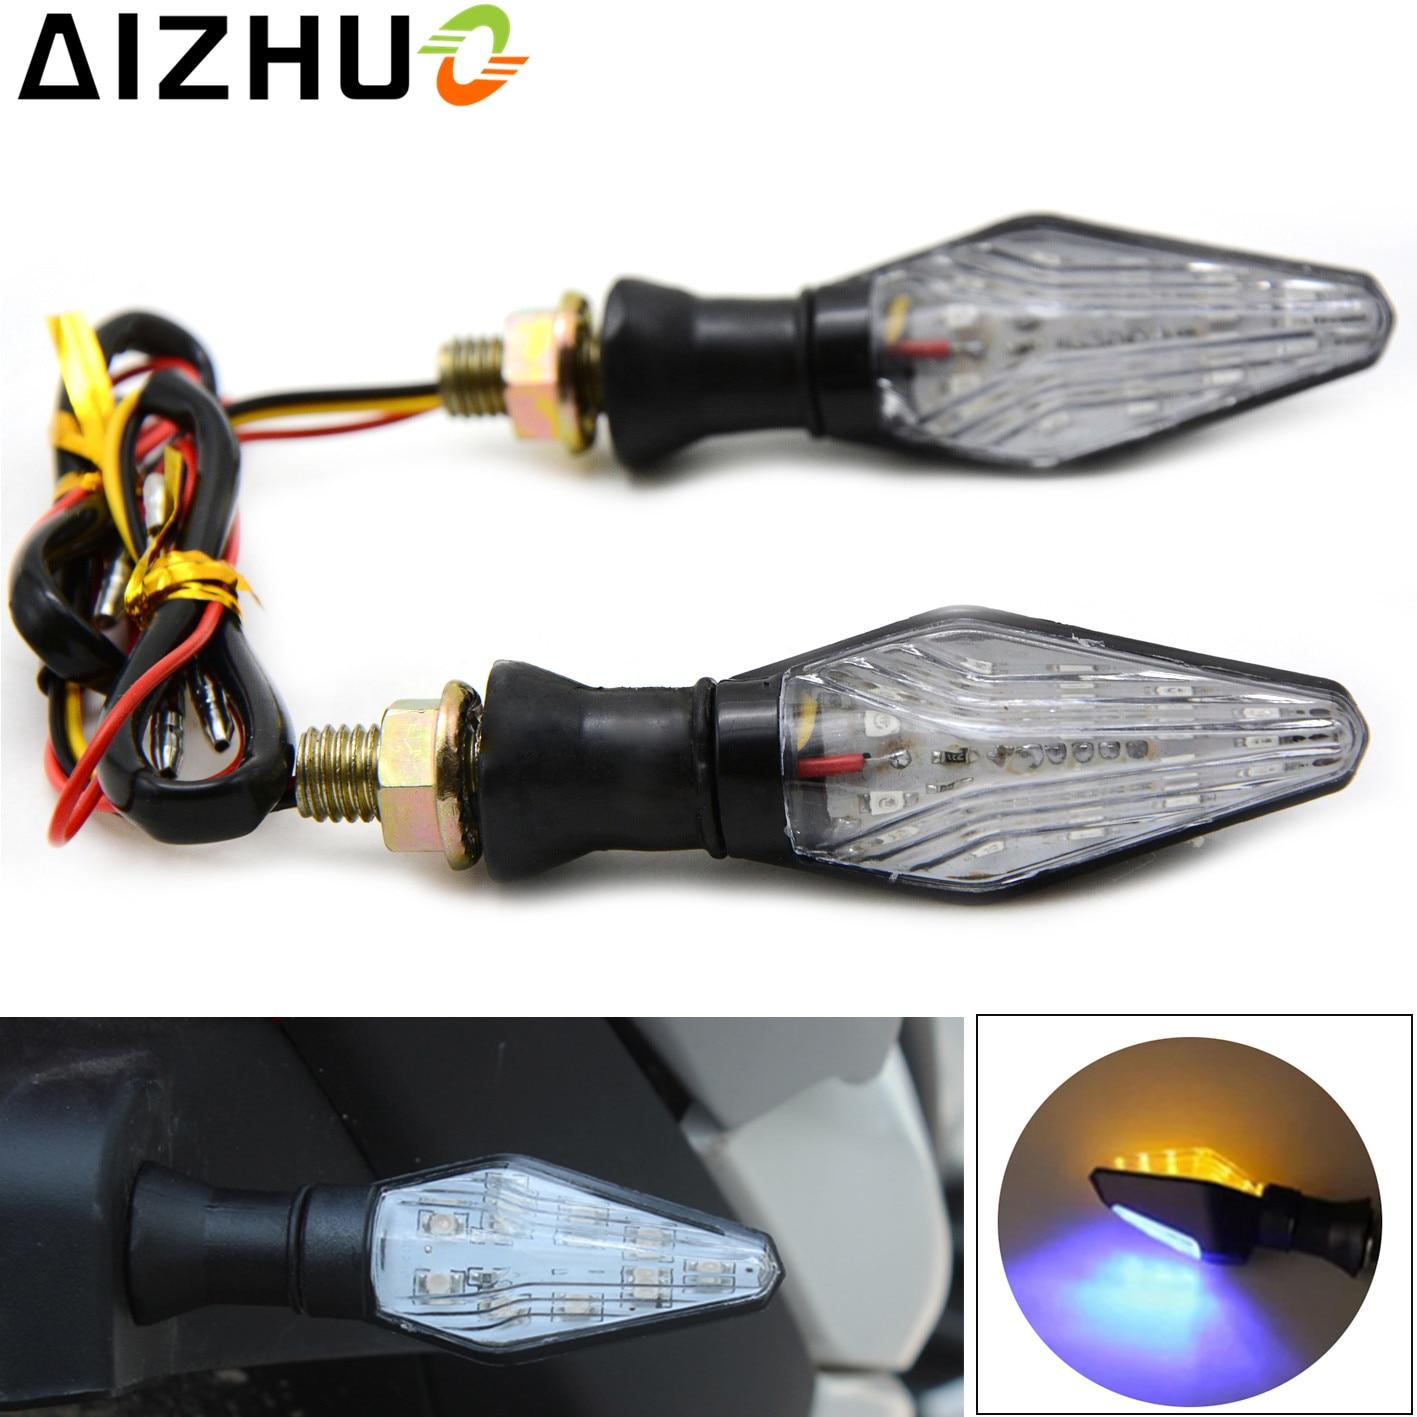 12V Motorcycle Turn Signal Light LED Lamp Blinker For kawasaki ER6N ER6F Z650 Z750 Z800 Z900 Z1000SX Ninja 650 650R Z 800 900